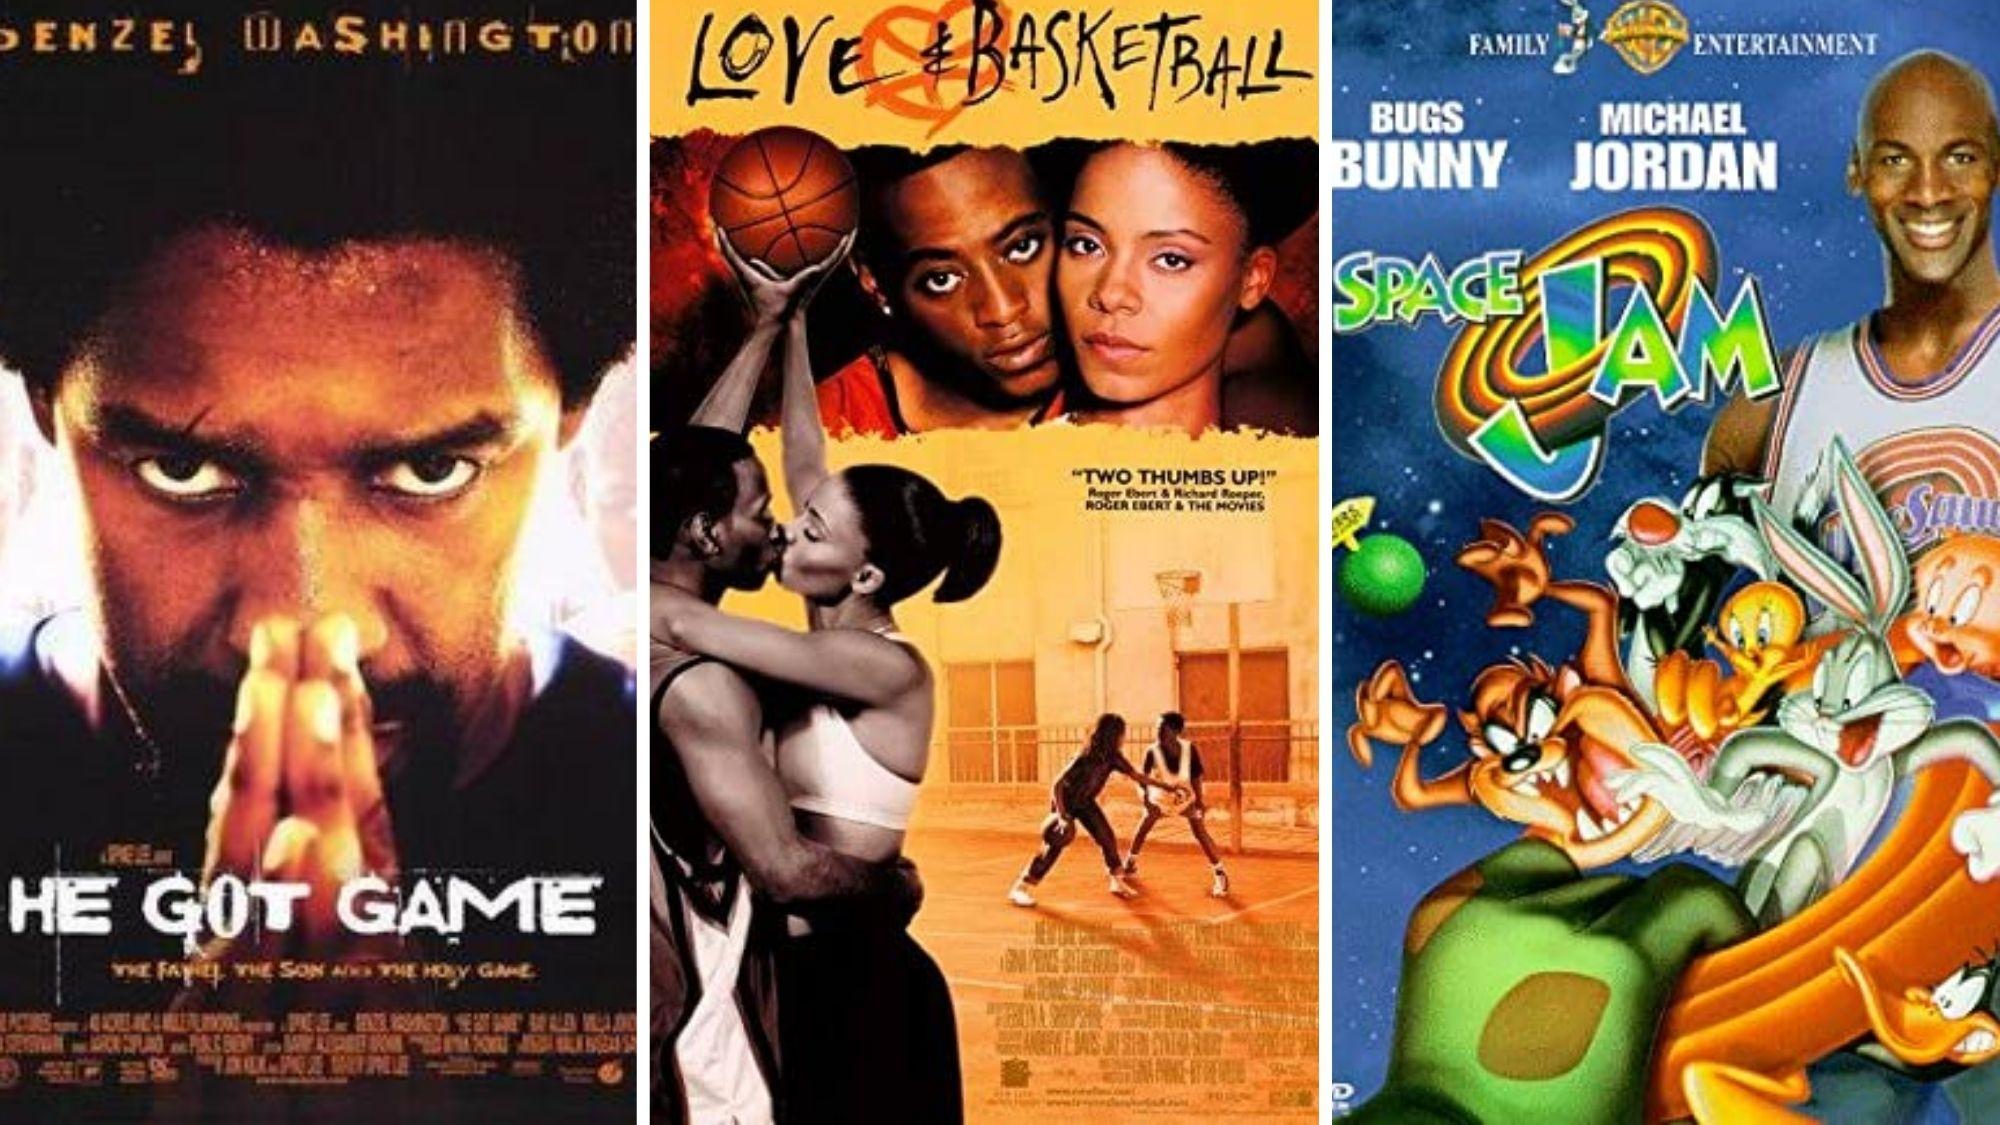 The Basketball Movie Hall of Fame